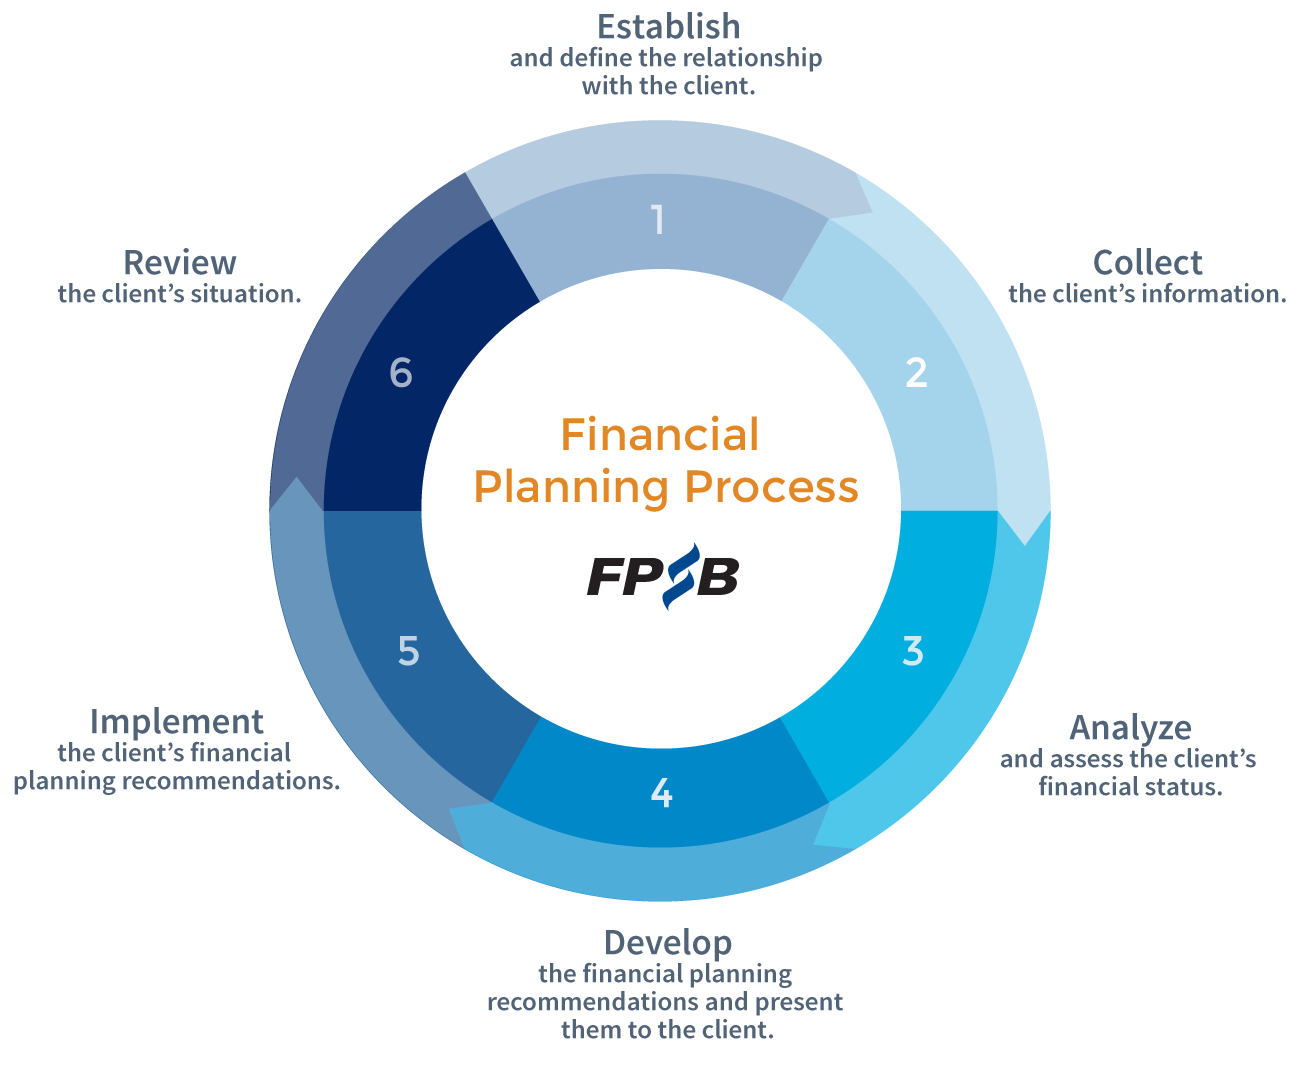 figure-process-steps-1-through-6-large-final-2016-06-06